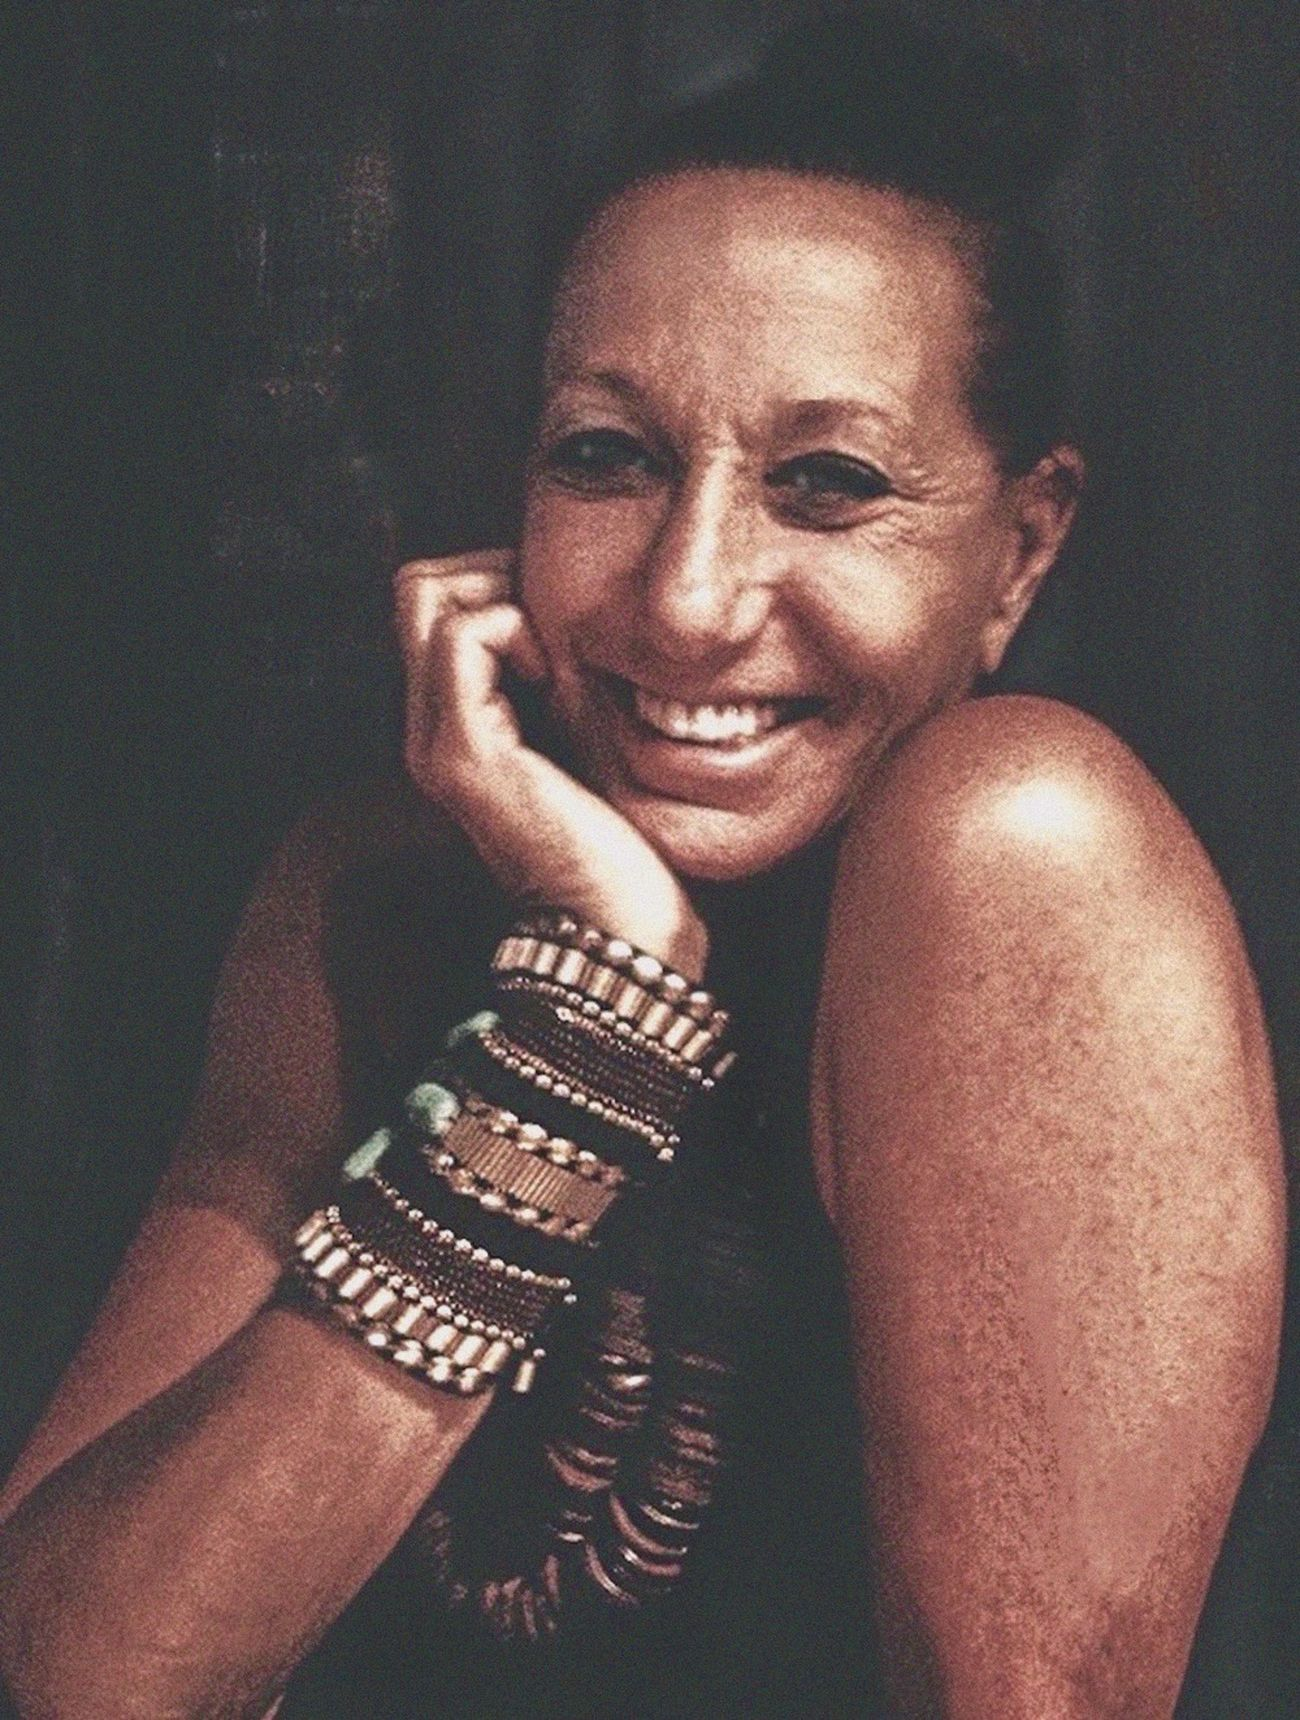 Donna Karan / NYC Fashion Designer Celebrity Portraiture DKNY DonnaKaranNY Bracelets- Handmade Necklace Smiling Style Icon Female Entreprenuer Canon Impromptu Portrait  The Portraitist - 2016 EyeEm Awards